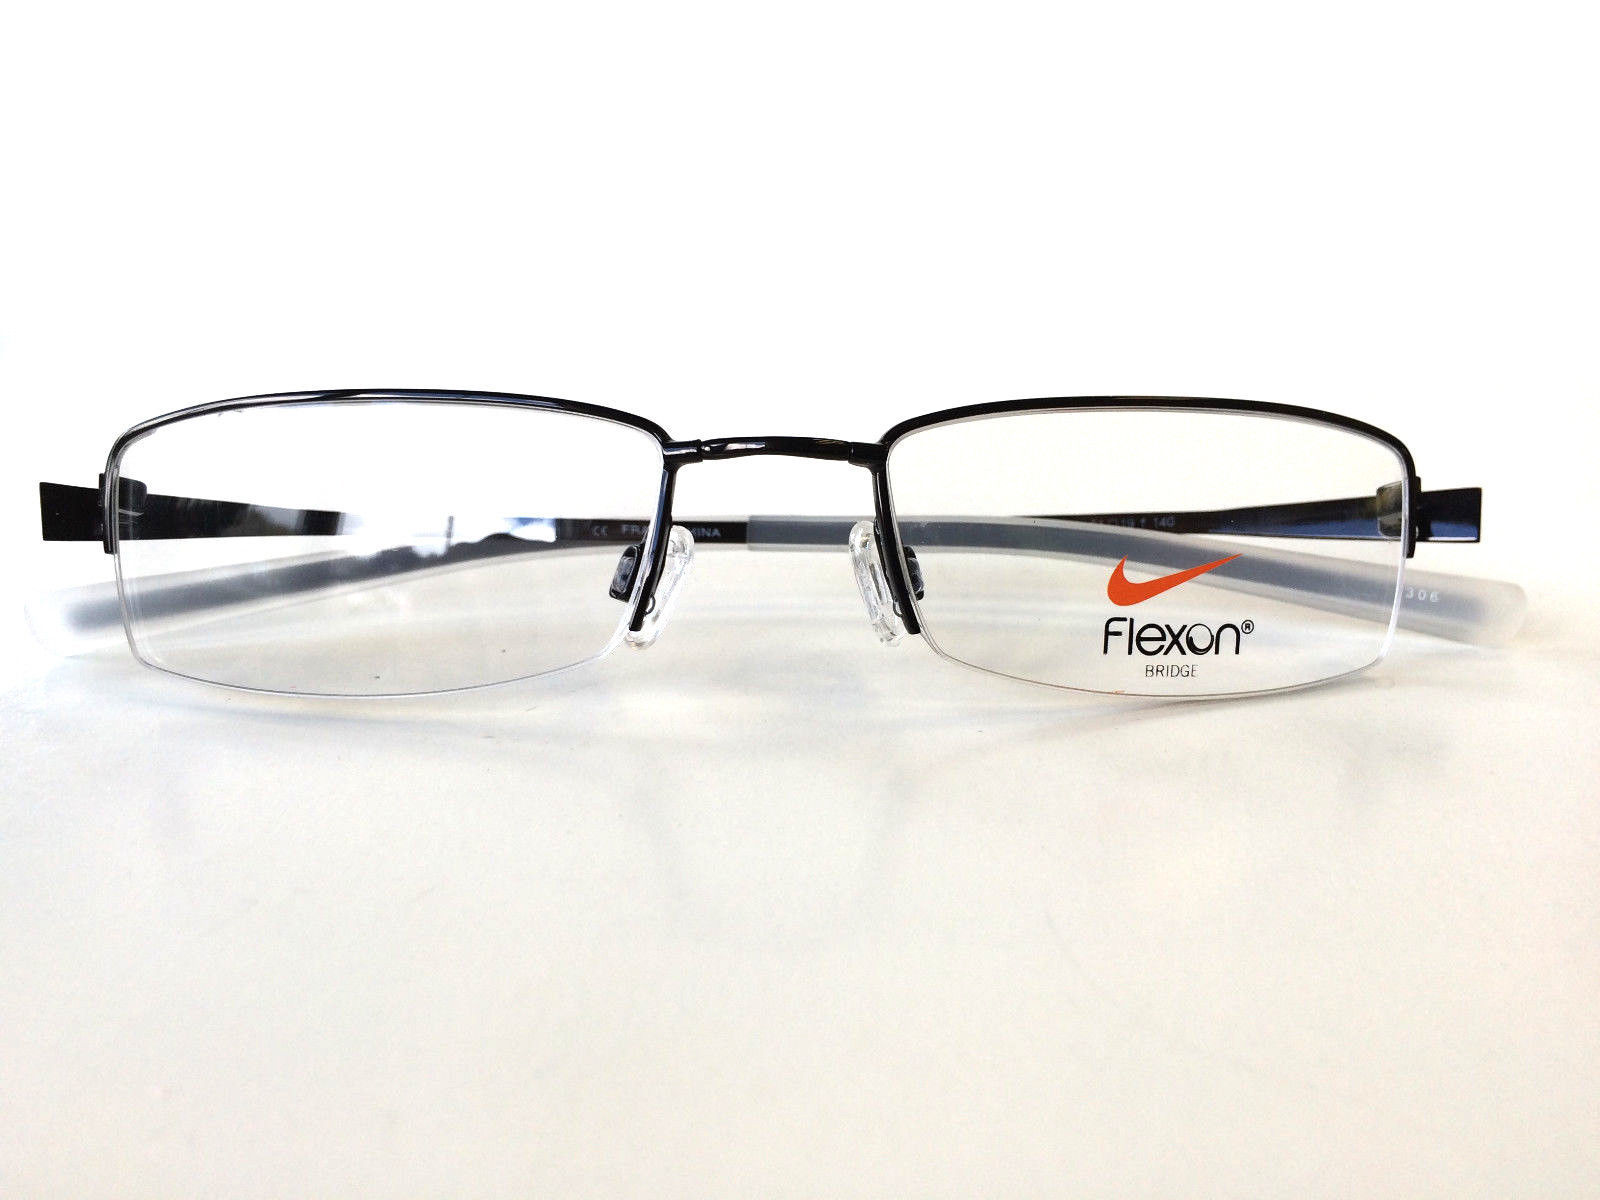 Nike Flexon Eyeglass Frame : Nike Flexon Eyeglass Frame Rimless NK 4222 Mens Eyewear ...